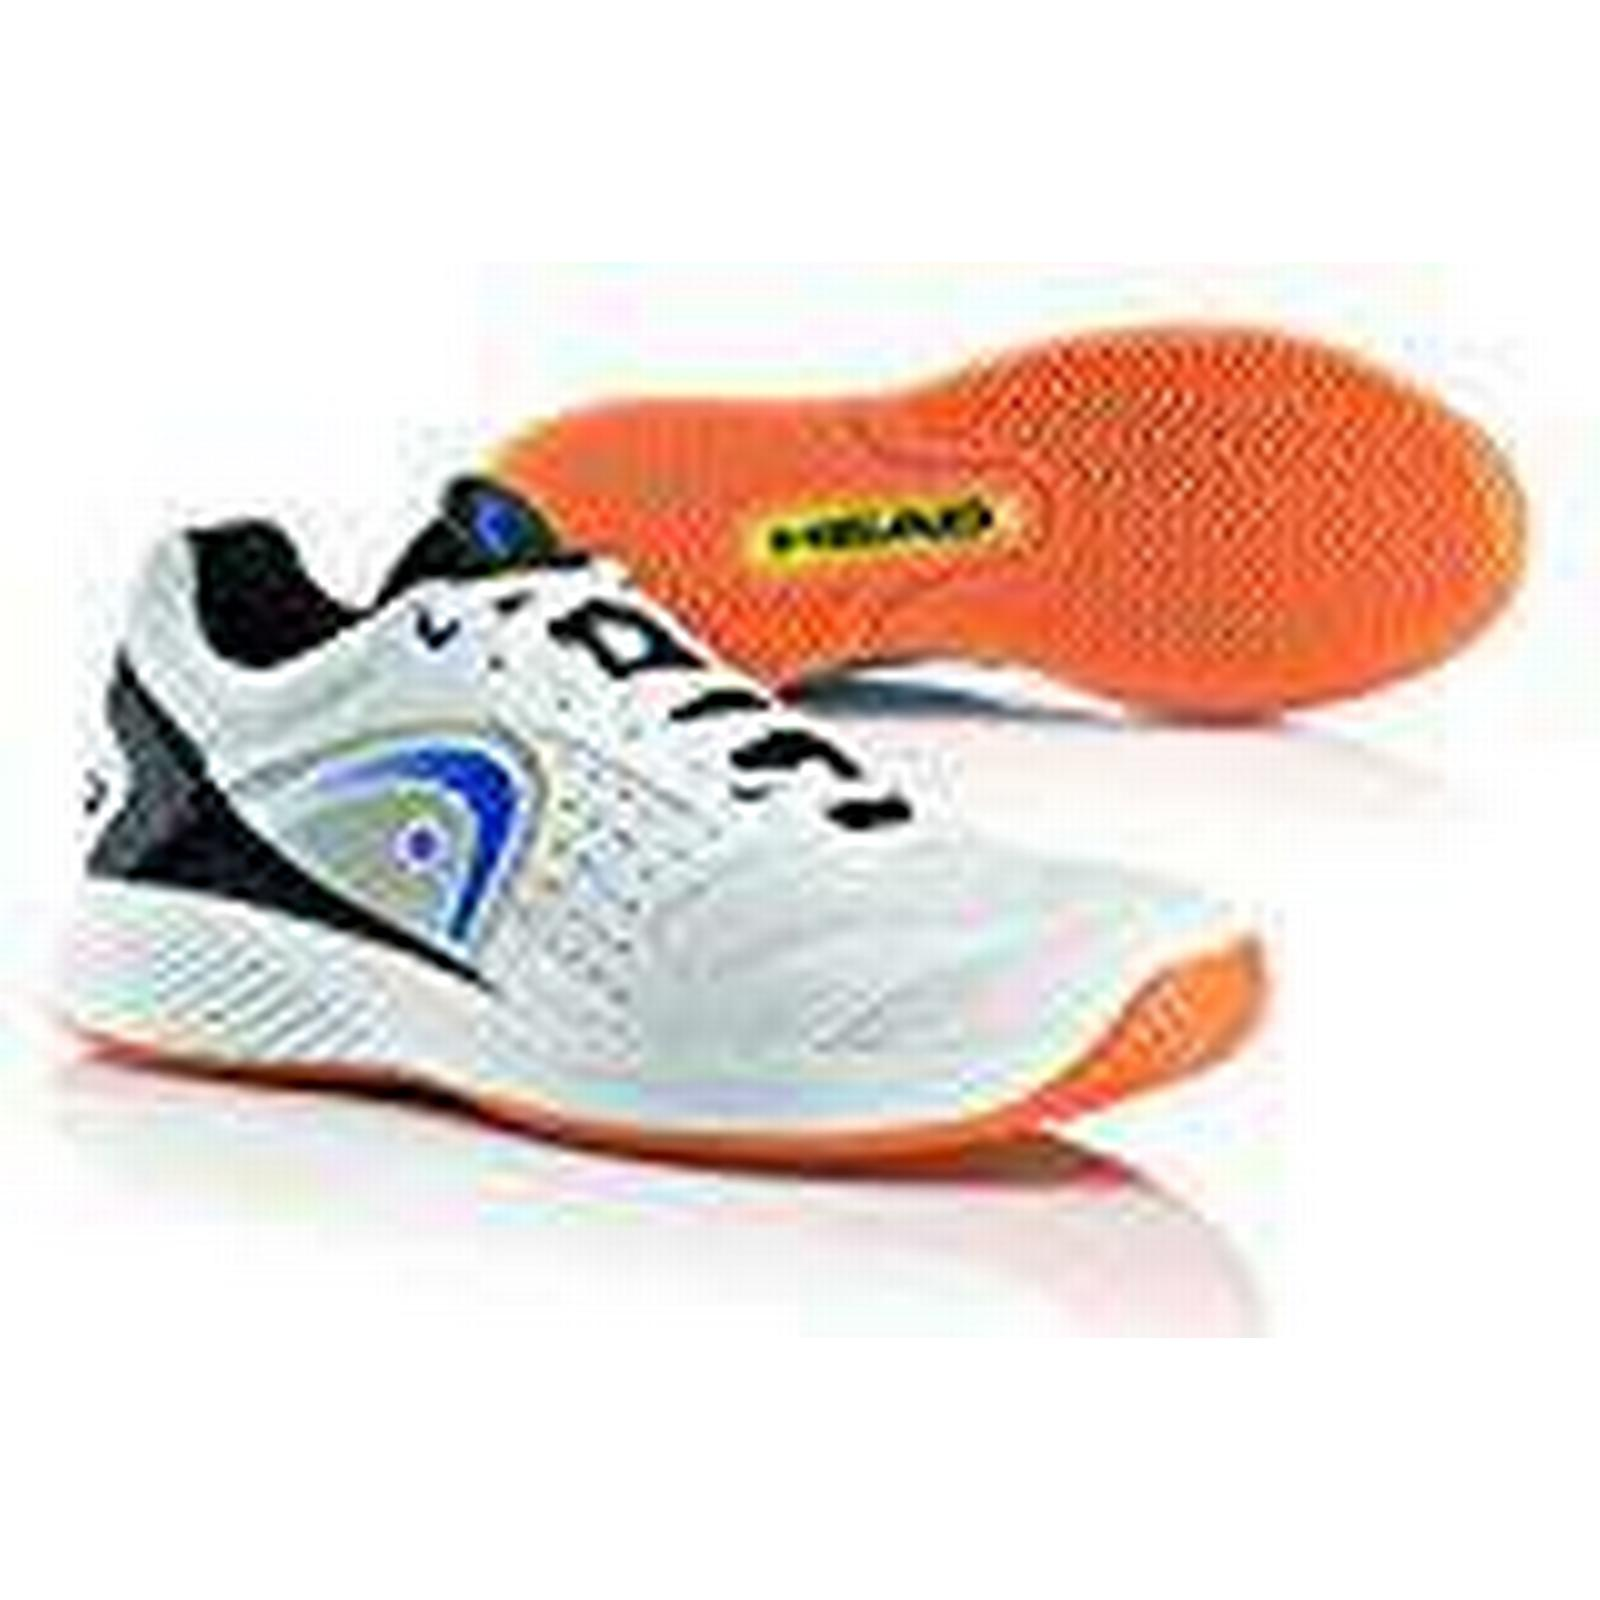 HEAD Men's Sprint Team Squash 8.5 Shoes, White (White/Blue/Black Whbb), 8.5 Squash UK 42.5 EU 1642a6